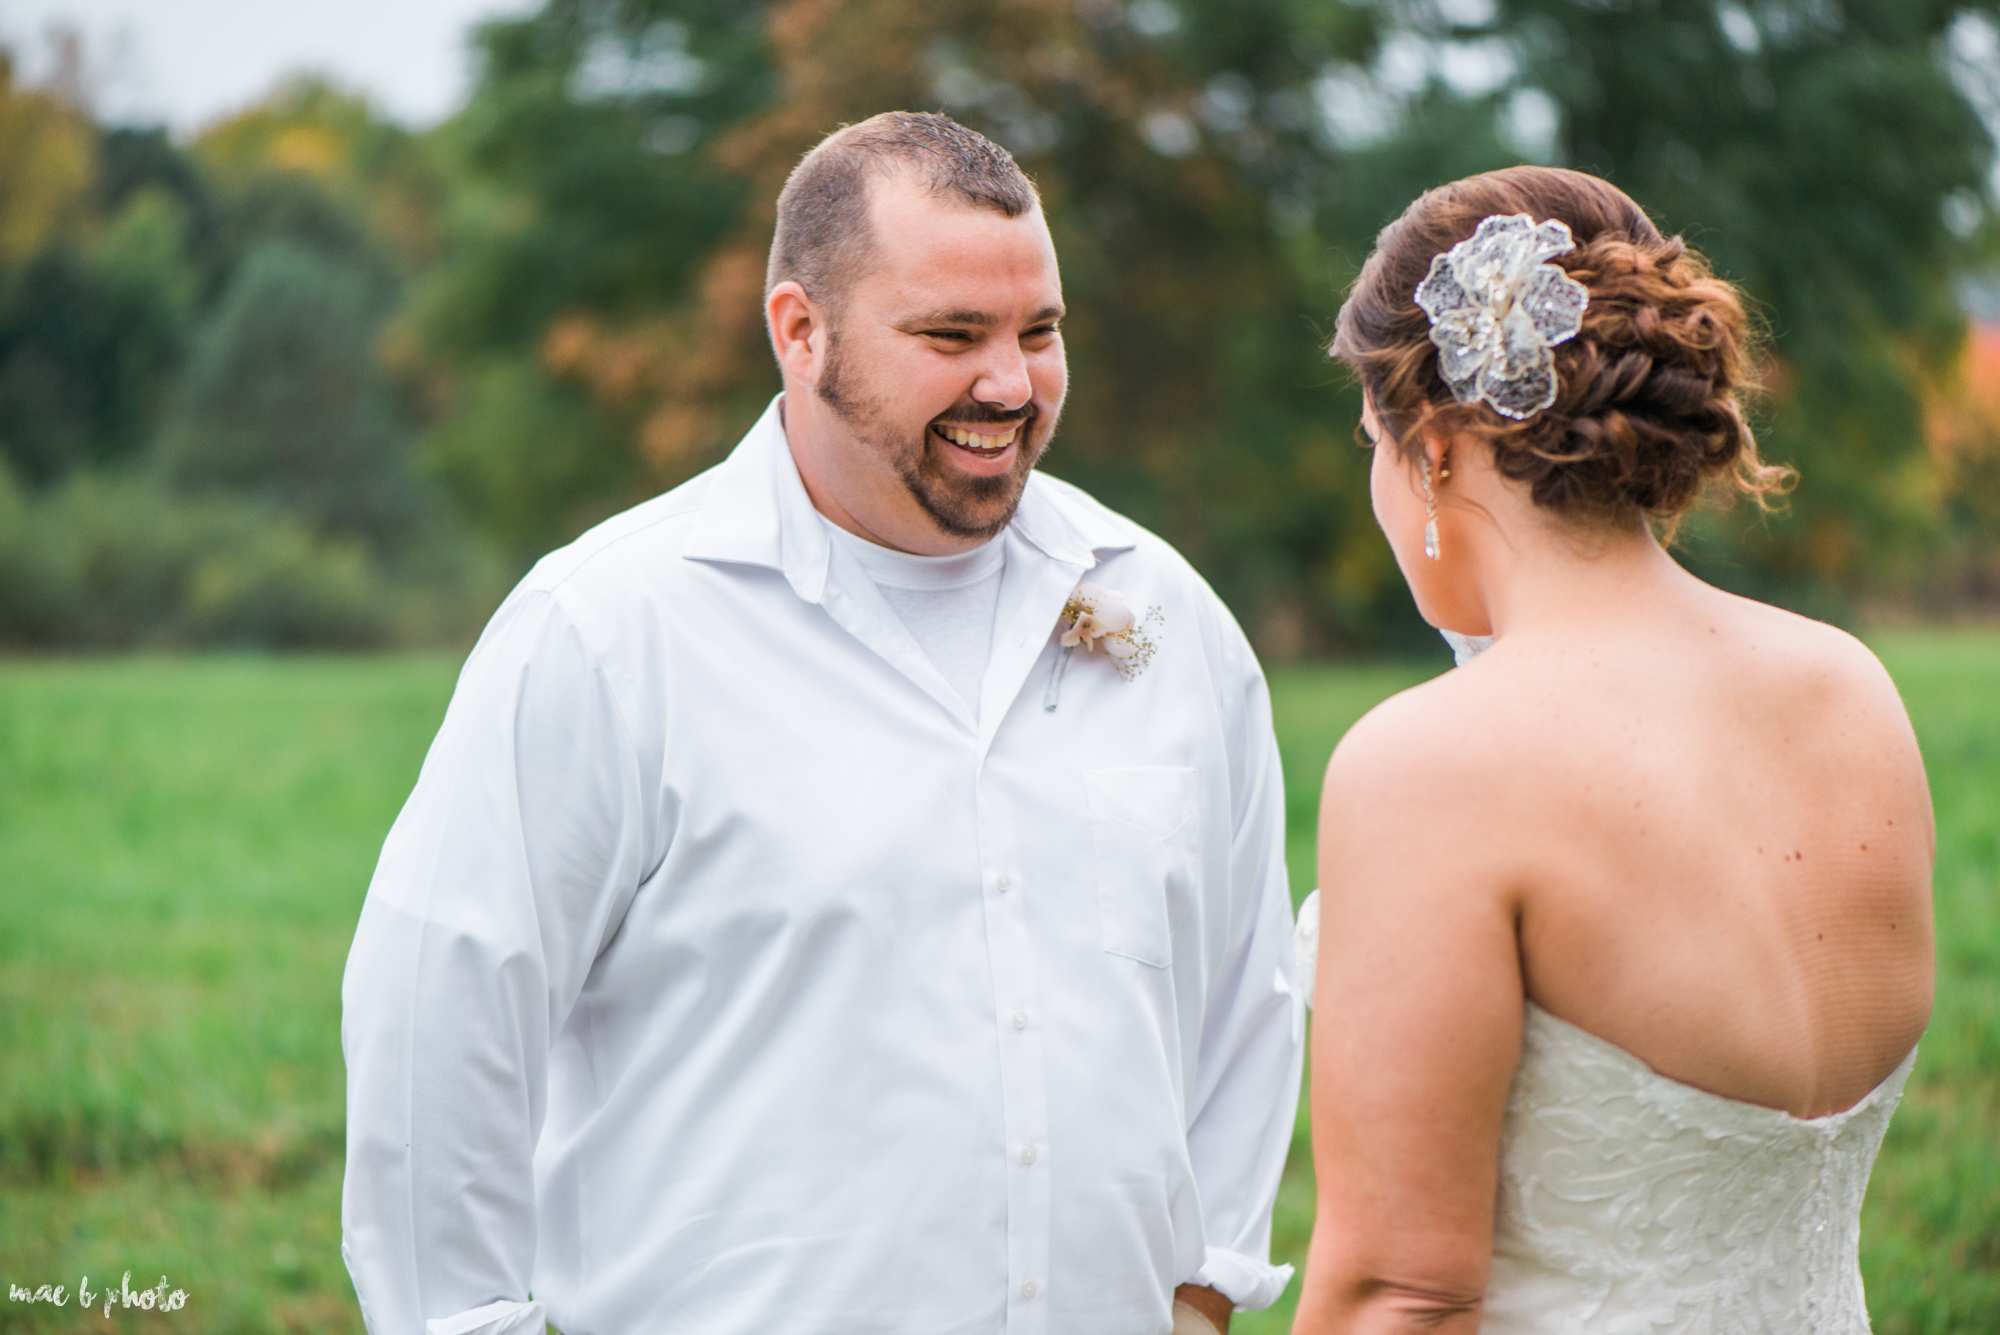 Sarah & Dustin's Rustic Chic Barn Wedding at Hartford Hill Winery in Hartford, Ohio by Mae B Photo-61.jpg